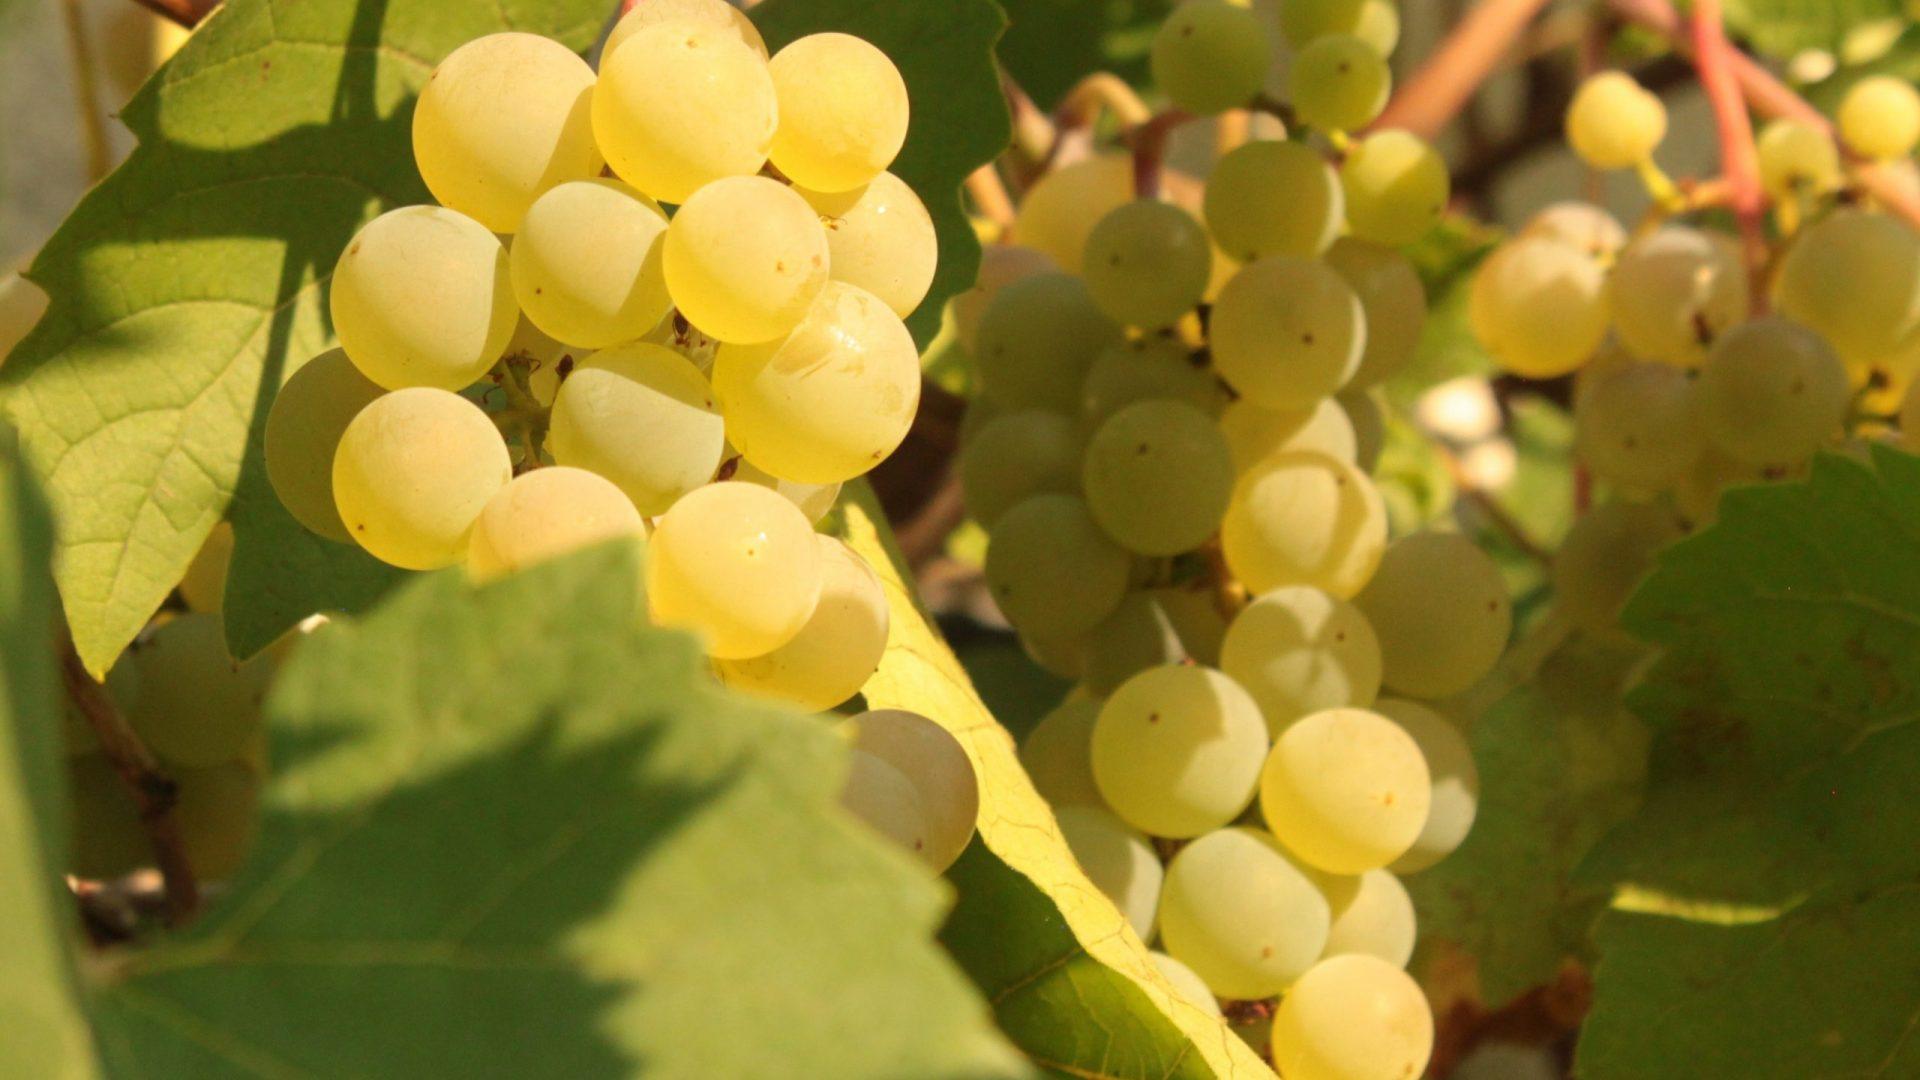 grapes-3602117